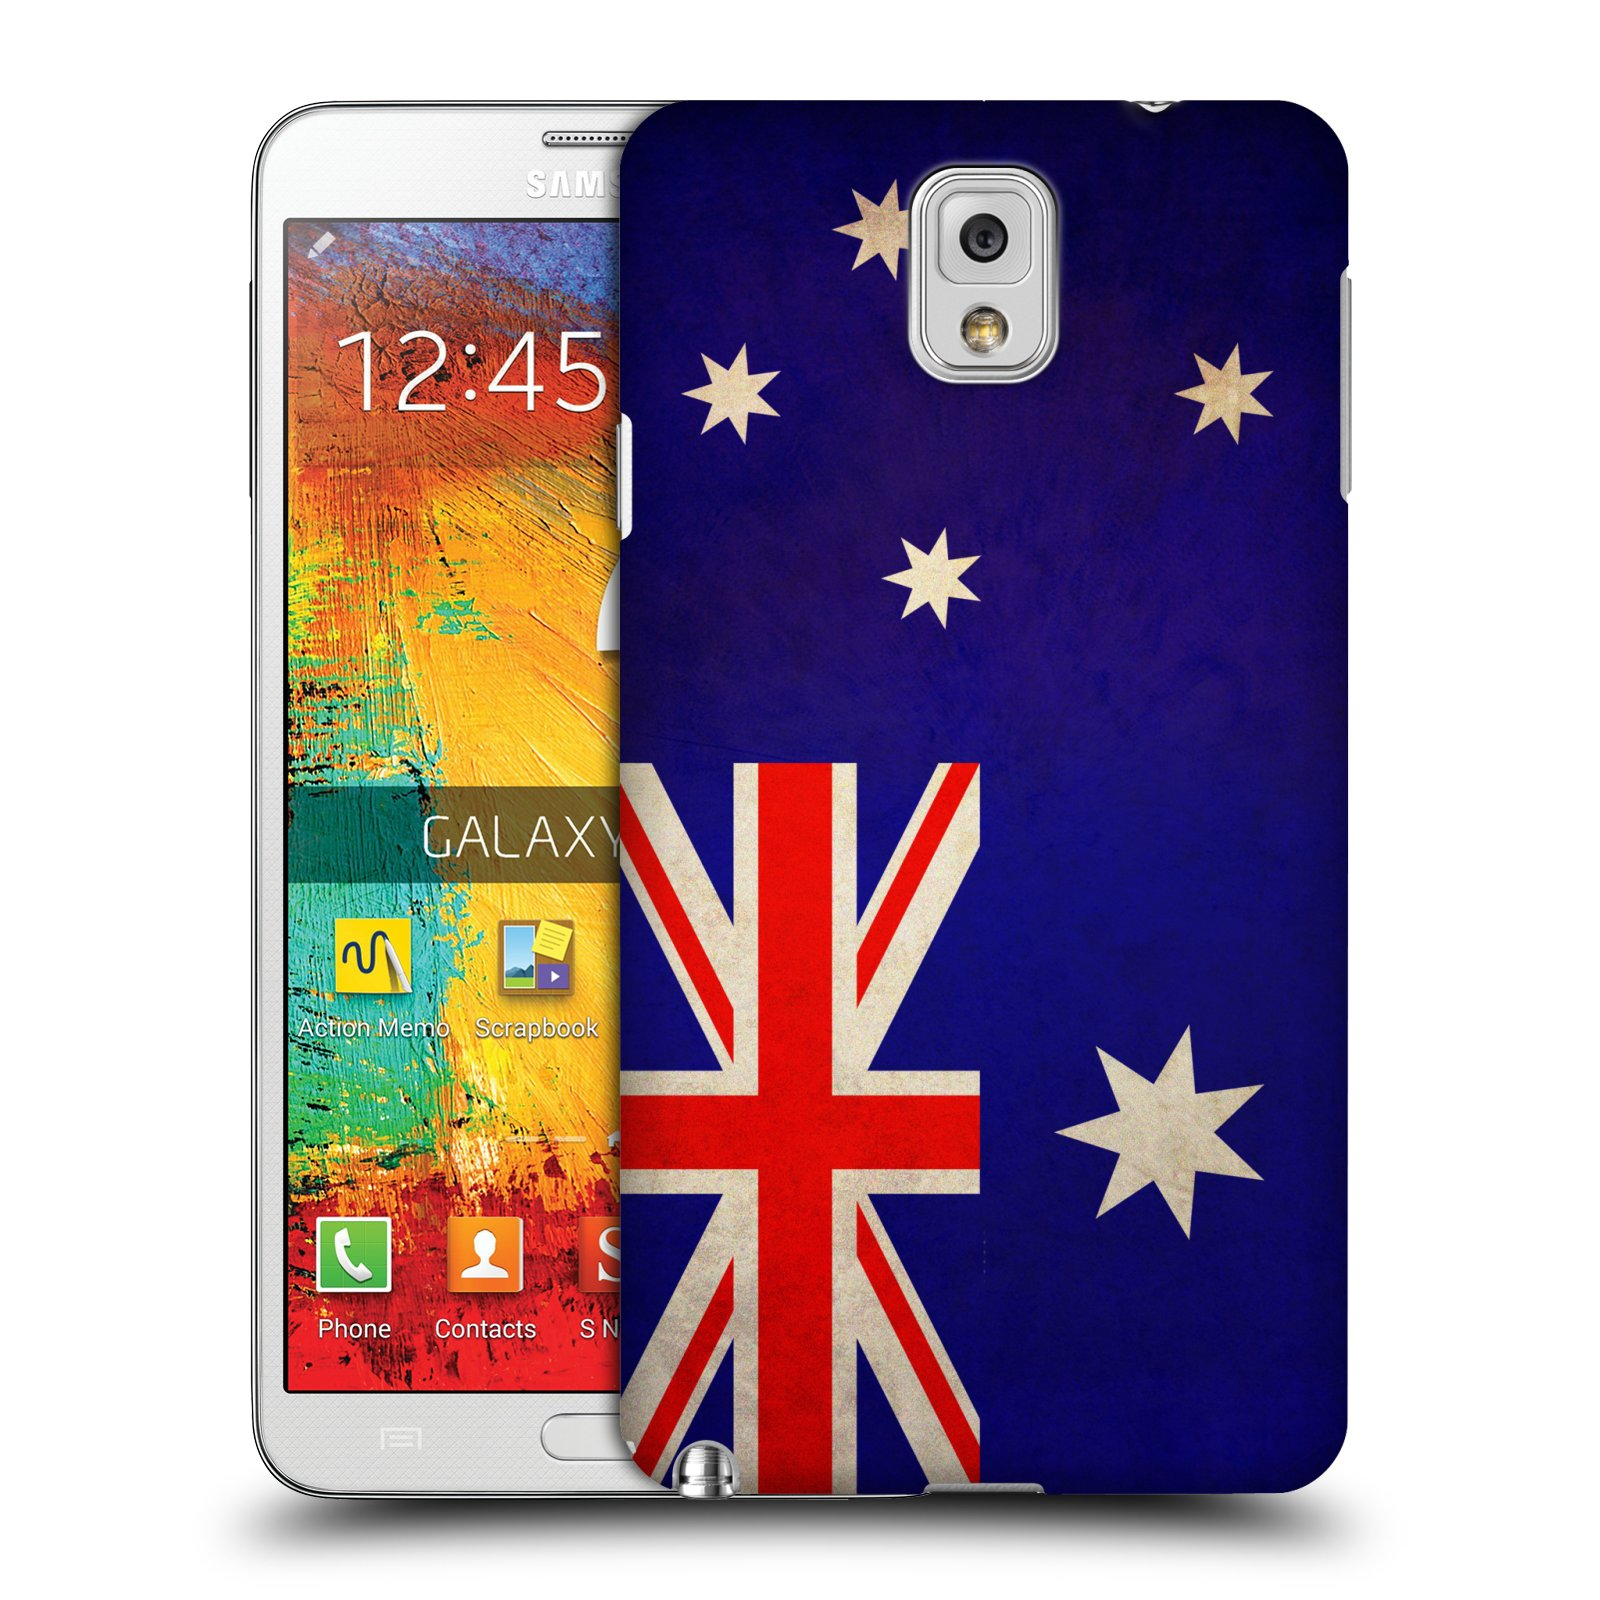 Plastové pouzdro na mobil Samsung Galaxy Note 3 HEAD CASE VLAJKA AUSTRÁLIE (Kryt či obal na mobilní telefon Samsung Galaxy Note 3 SM-N9005)